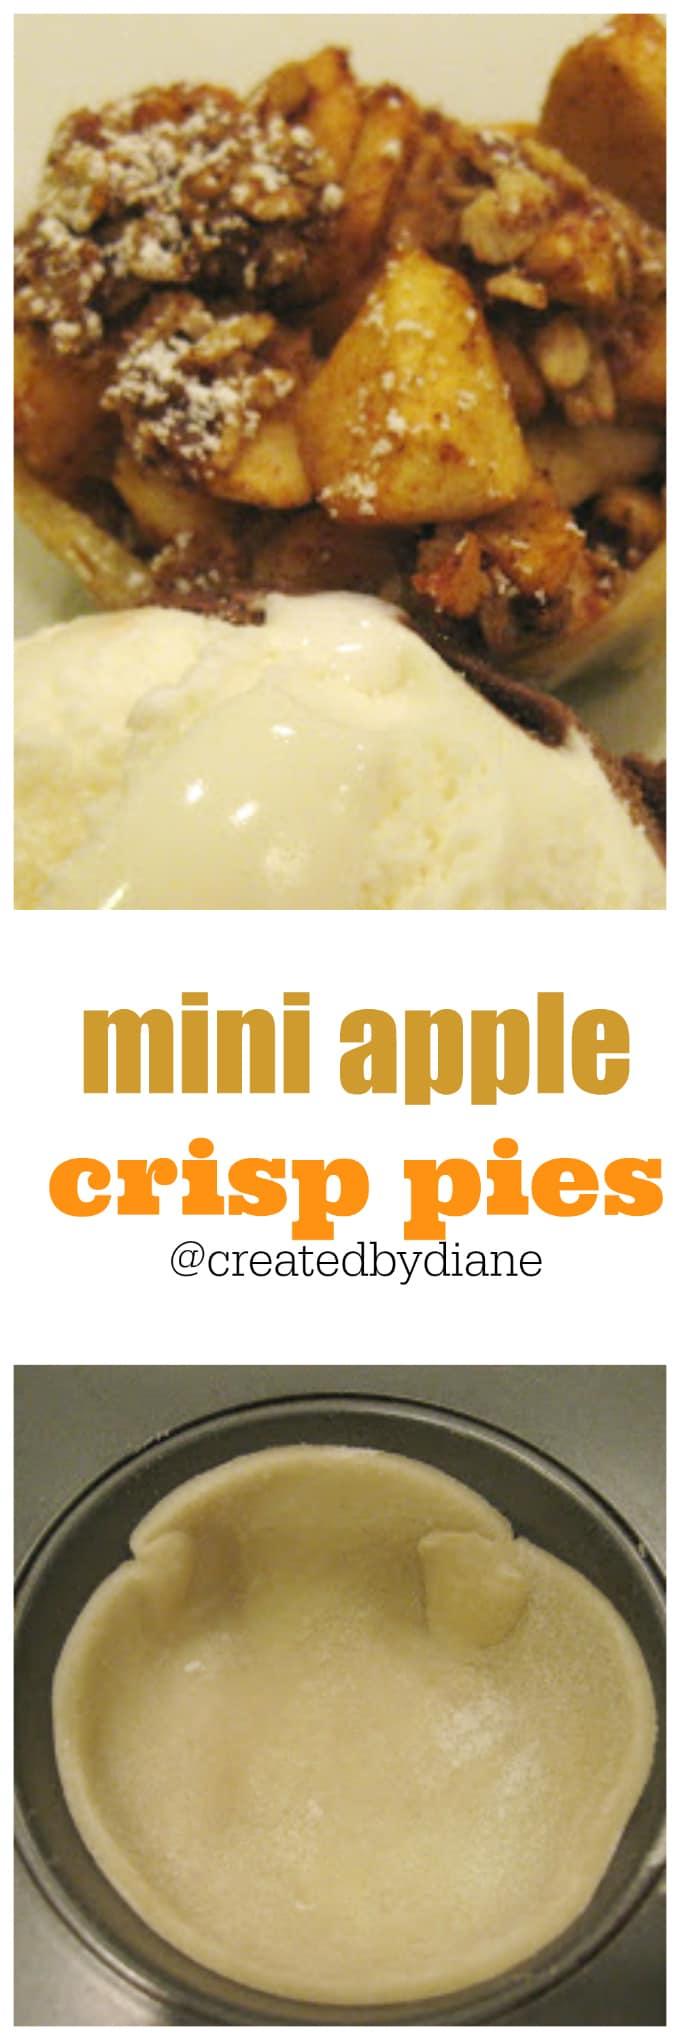 mini apple crisp pies @createdbydiane